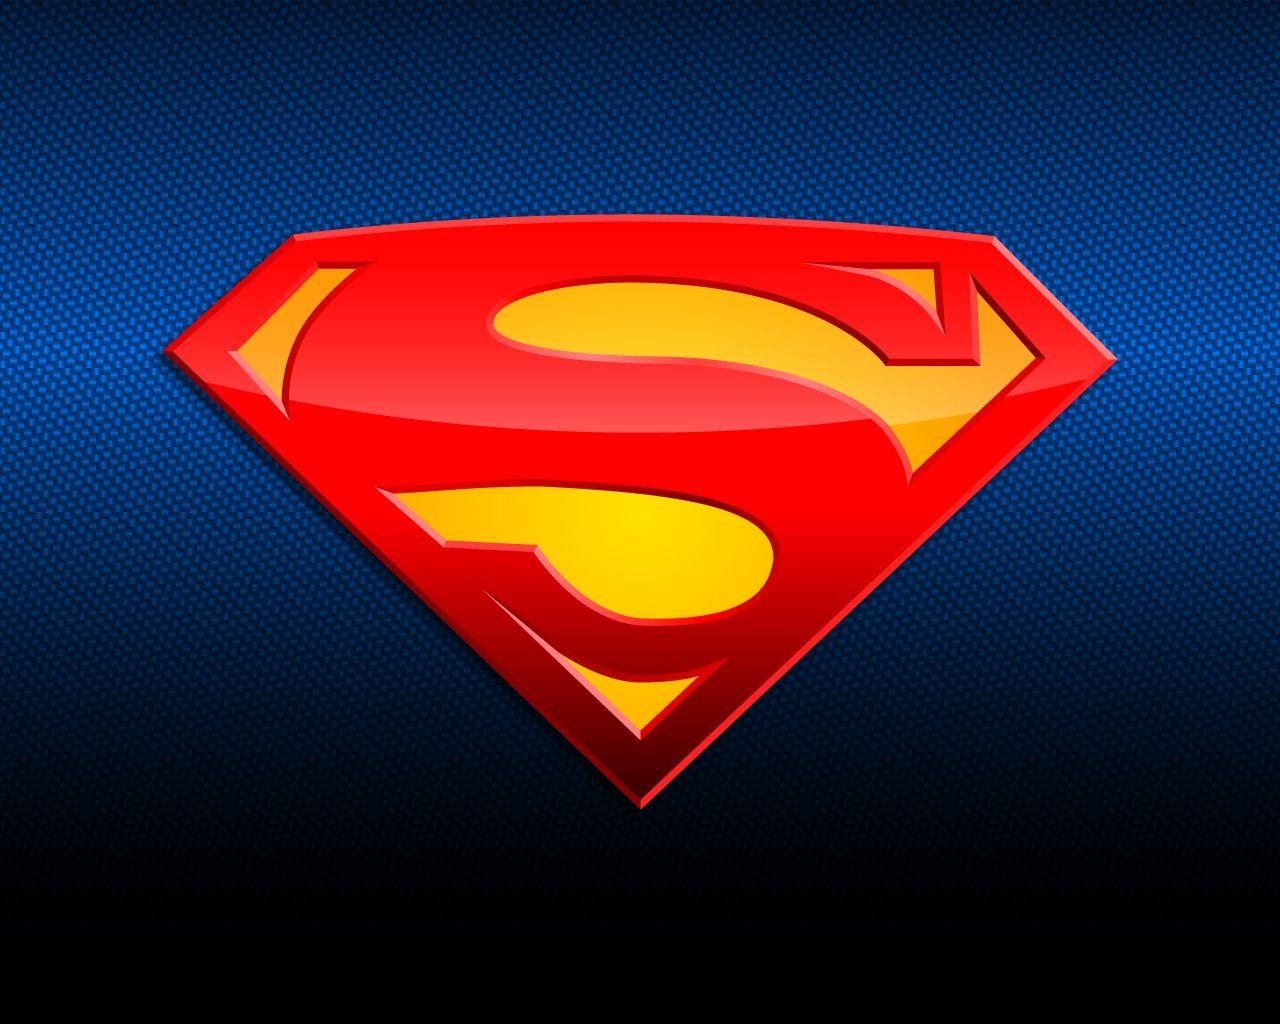 Explore Superman Symbol Wallpaper And More